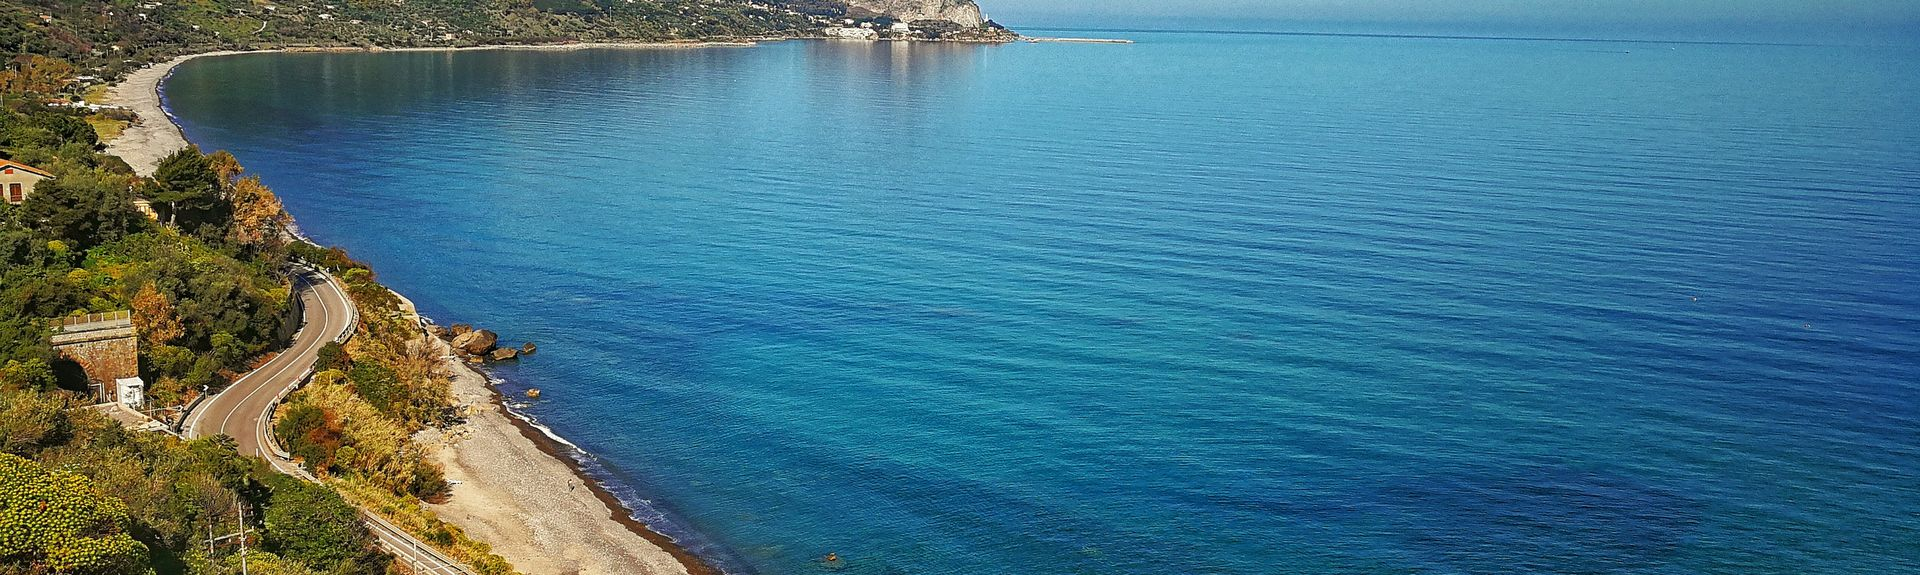 Gorgo Lungo, Lascari, Sicily, Italy